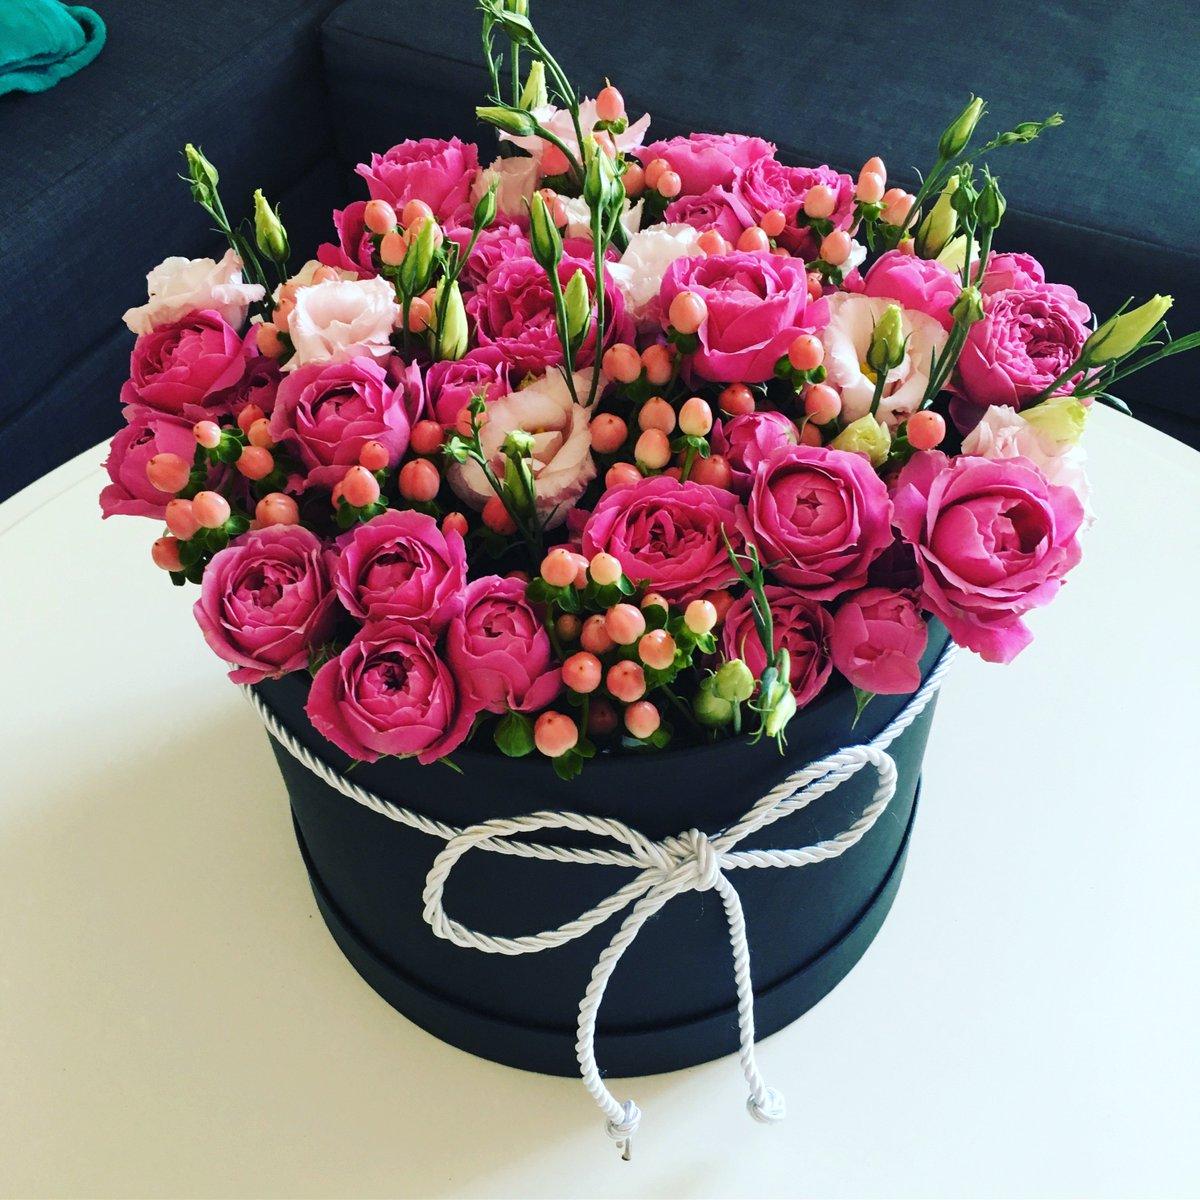 "Bloom Box London on Twitter: ""Beautiful flowers in a box"